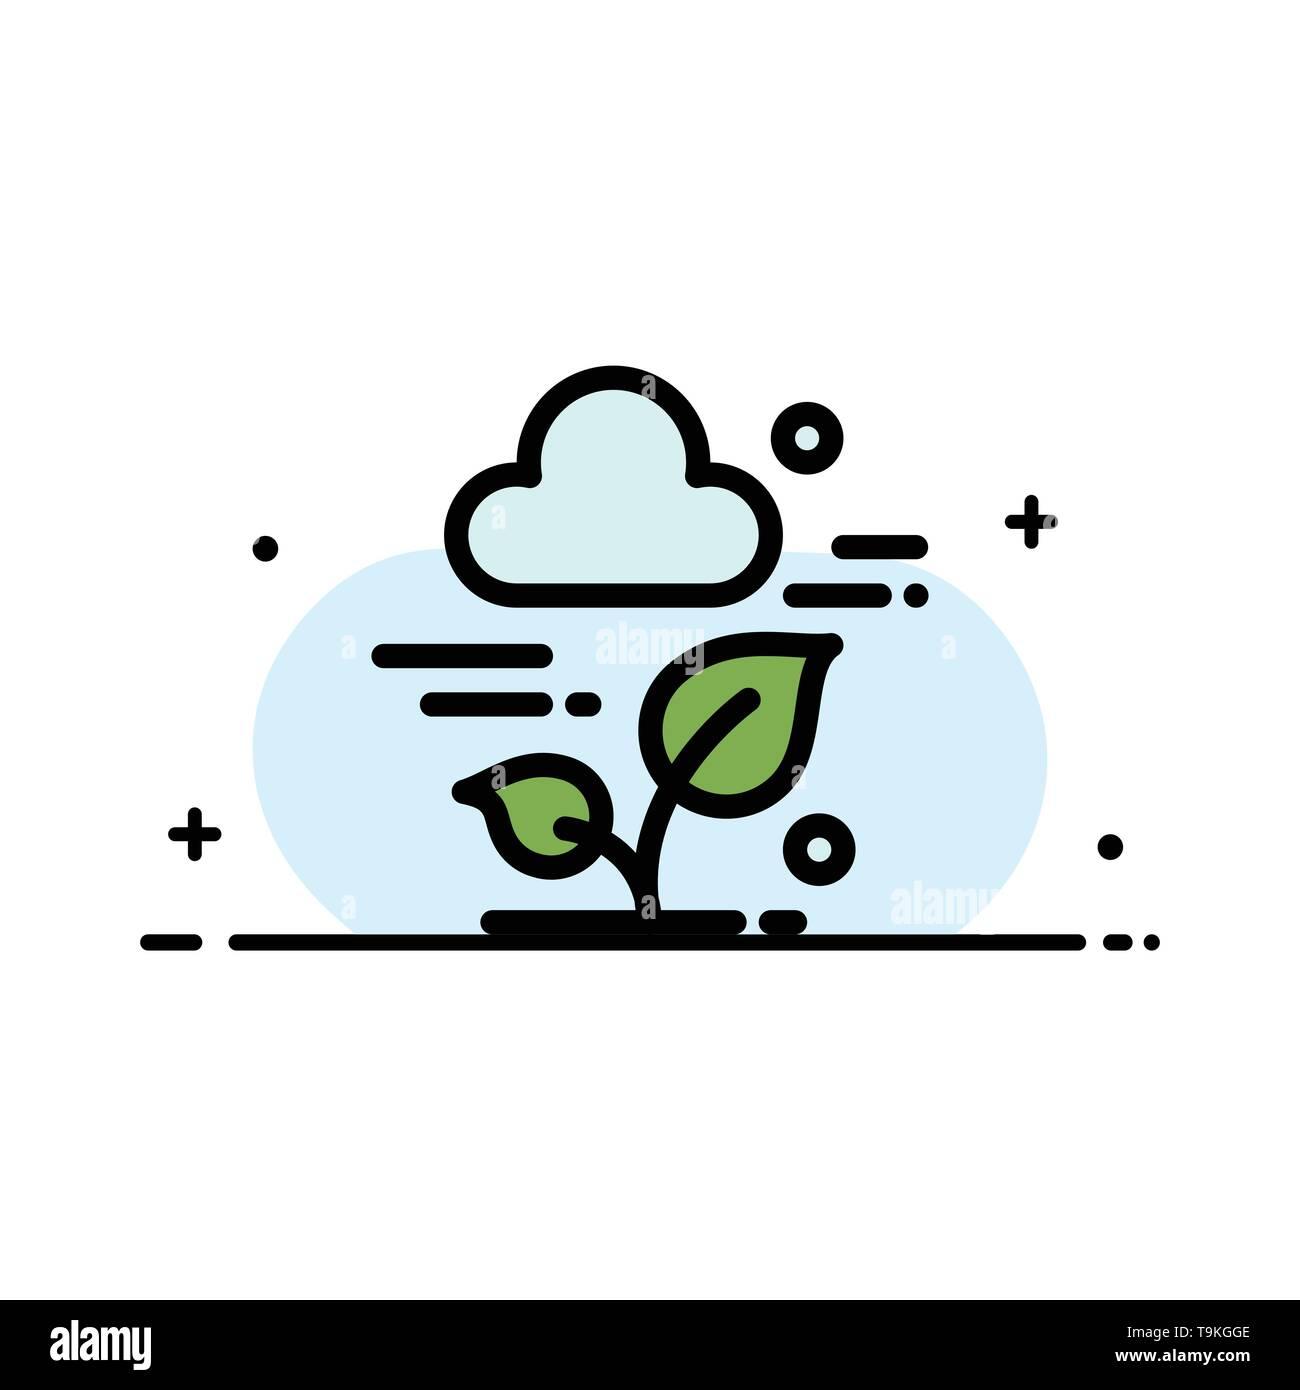 Pflanze, Cloud, Blatt, Technologie Business Flat Line gefüllt Symbol Vektor Banner Vorlage Stockbild